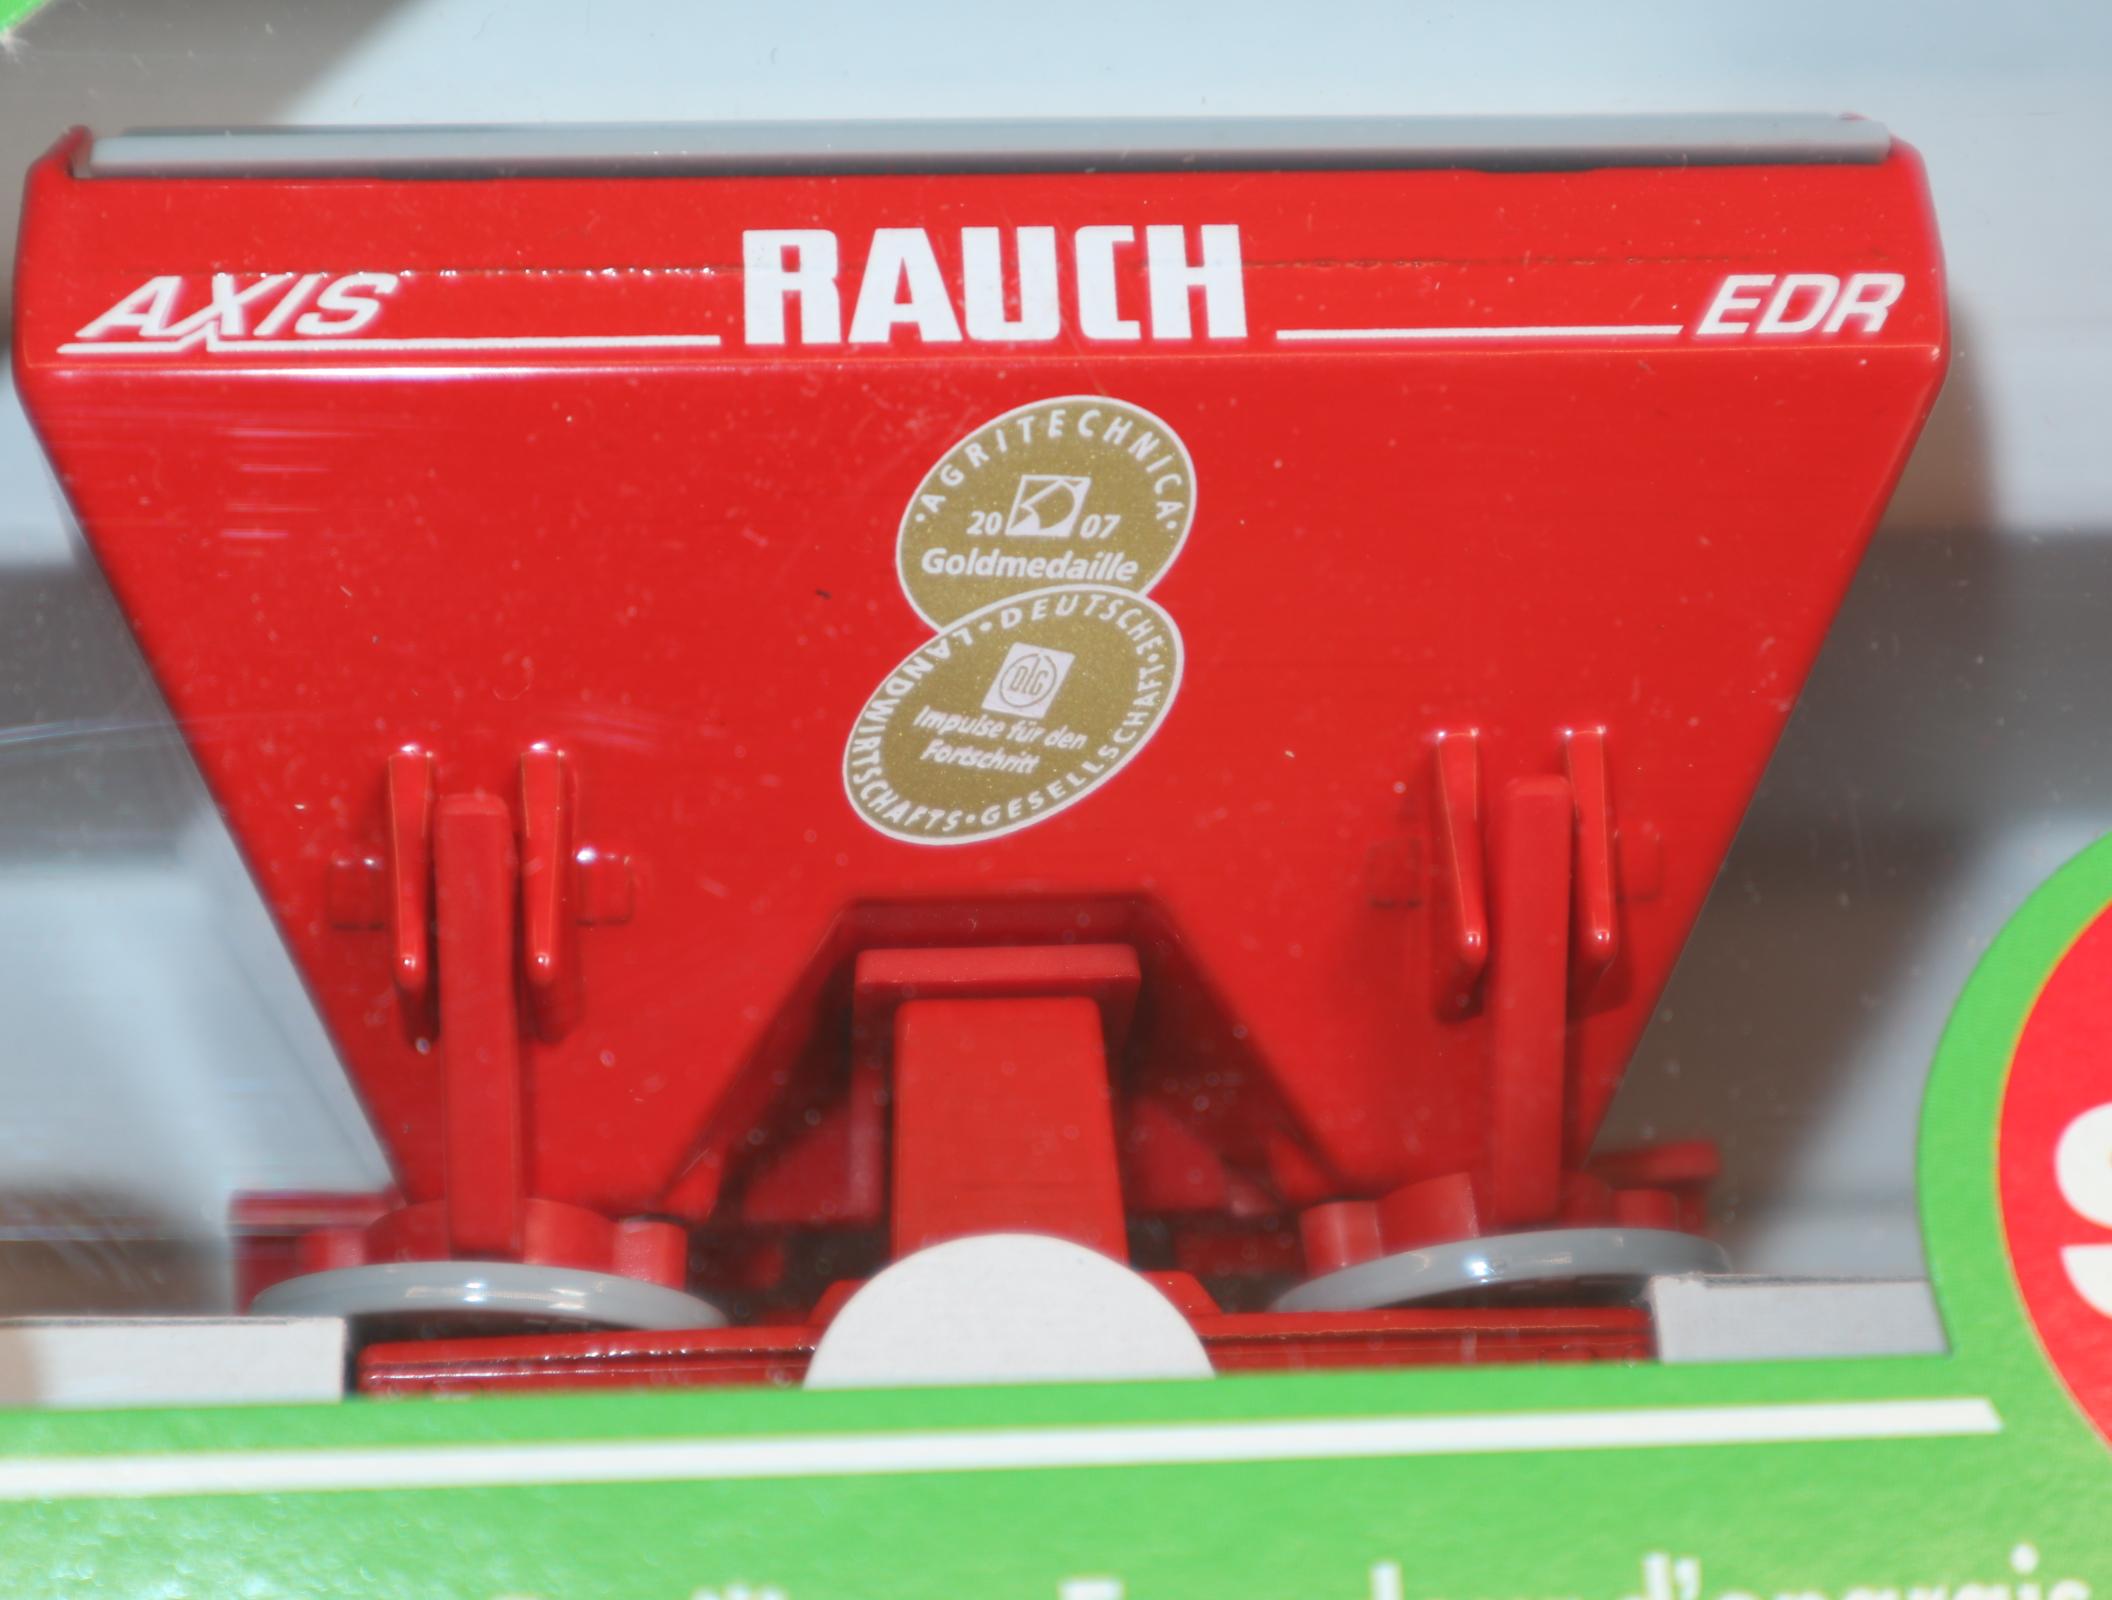 Siku 2050 1:32 RAUCH Axis EDR Sondermodel Agritechnica 2007 in OVP